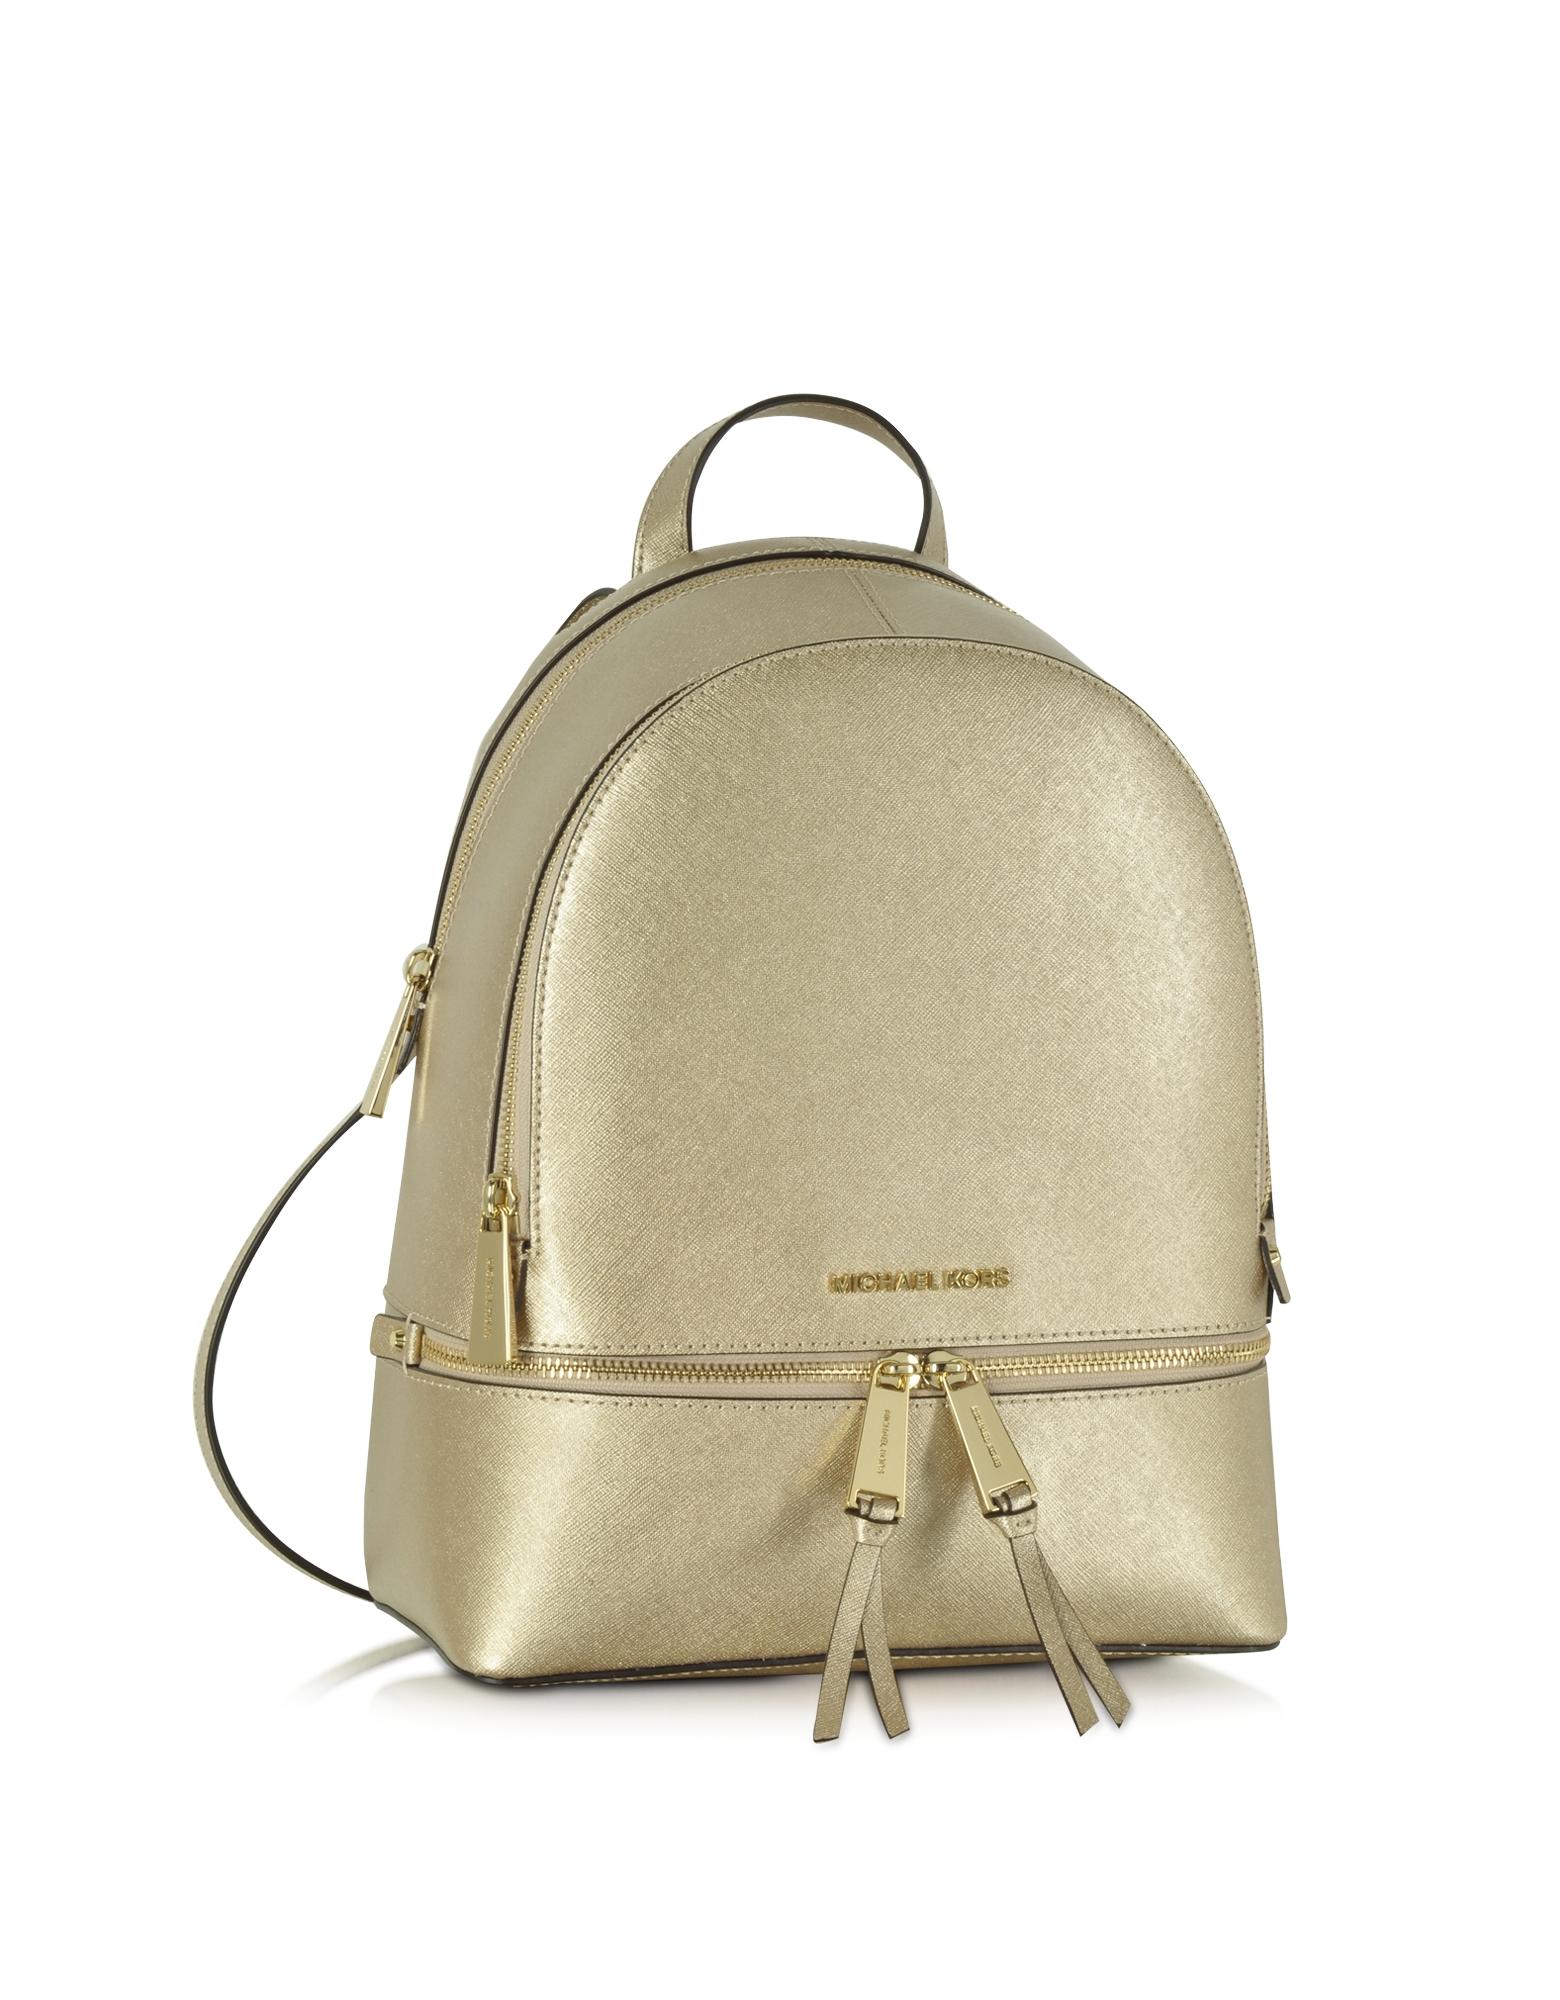 fc4274e3734a Lyst - Michael Kors Rhea Zip Pale Gold Medium Backpack in Metallic